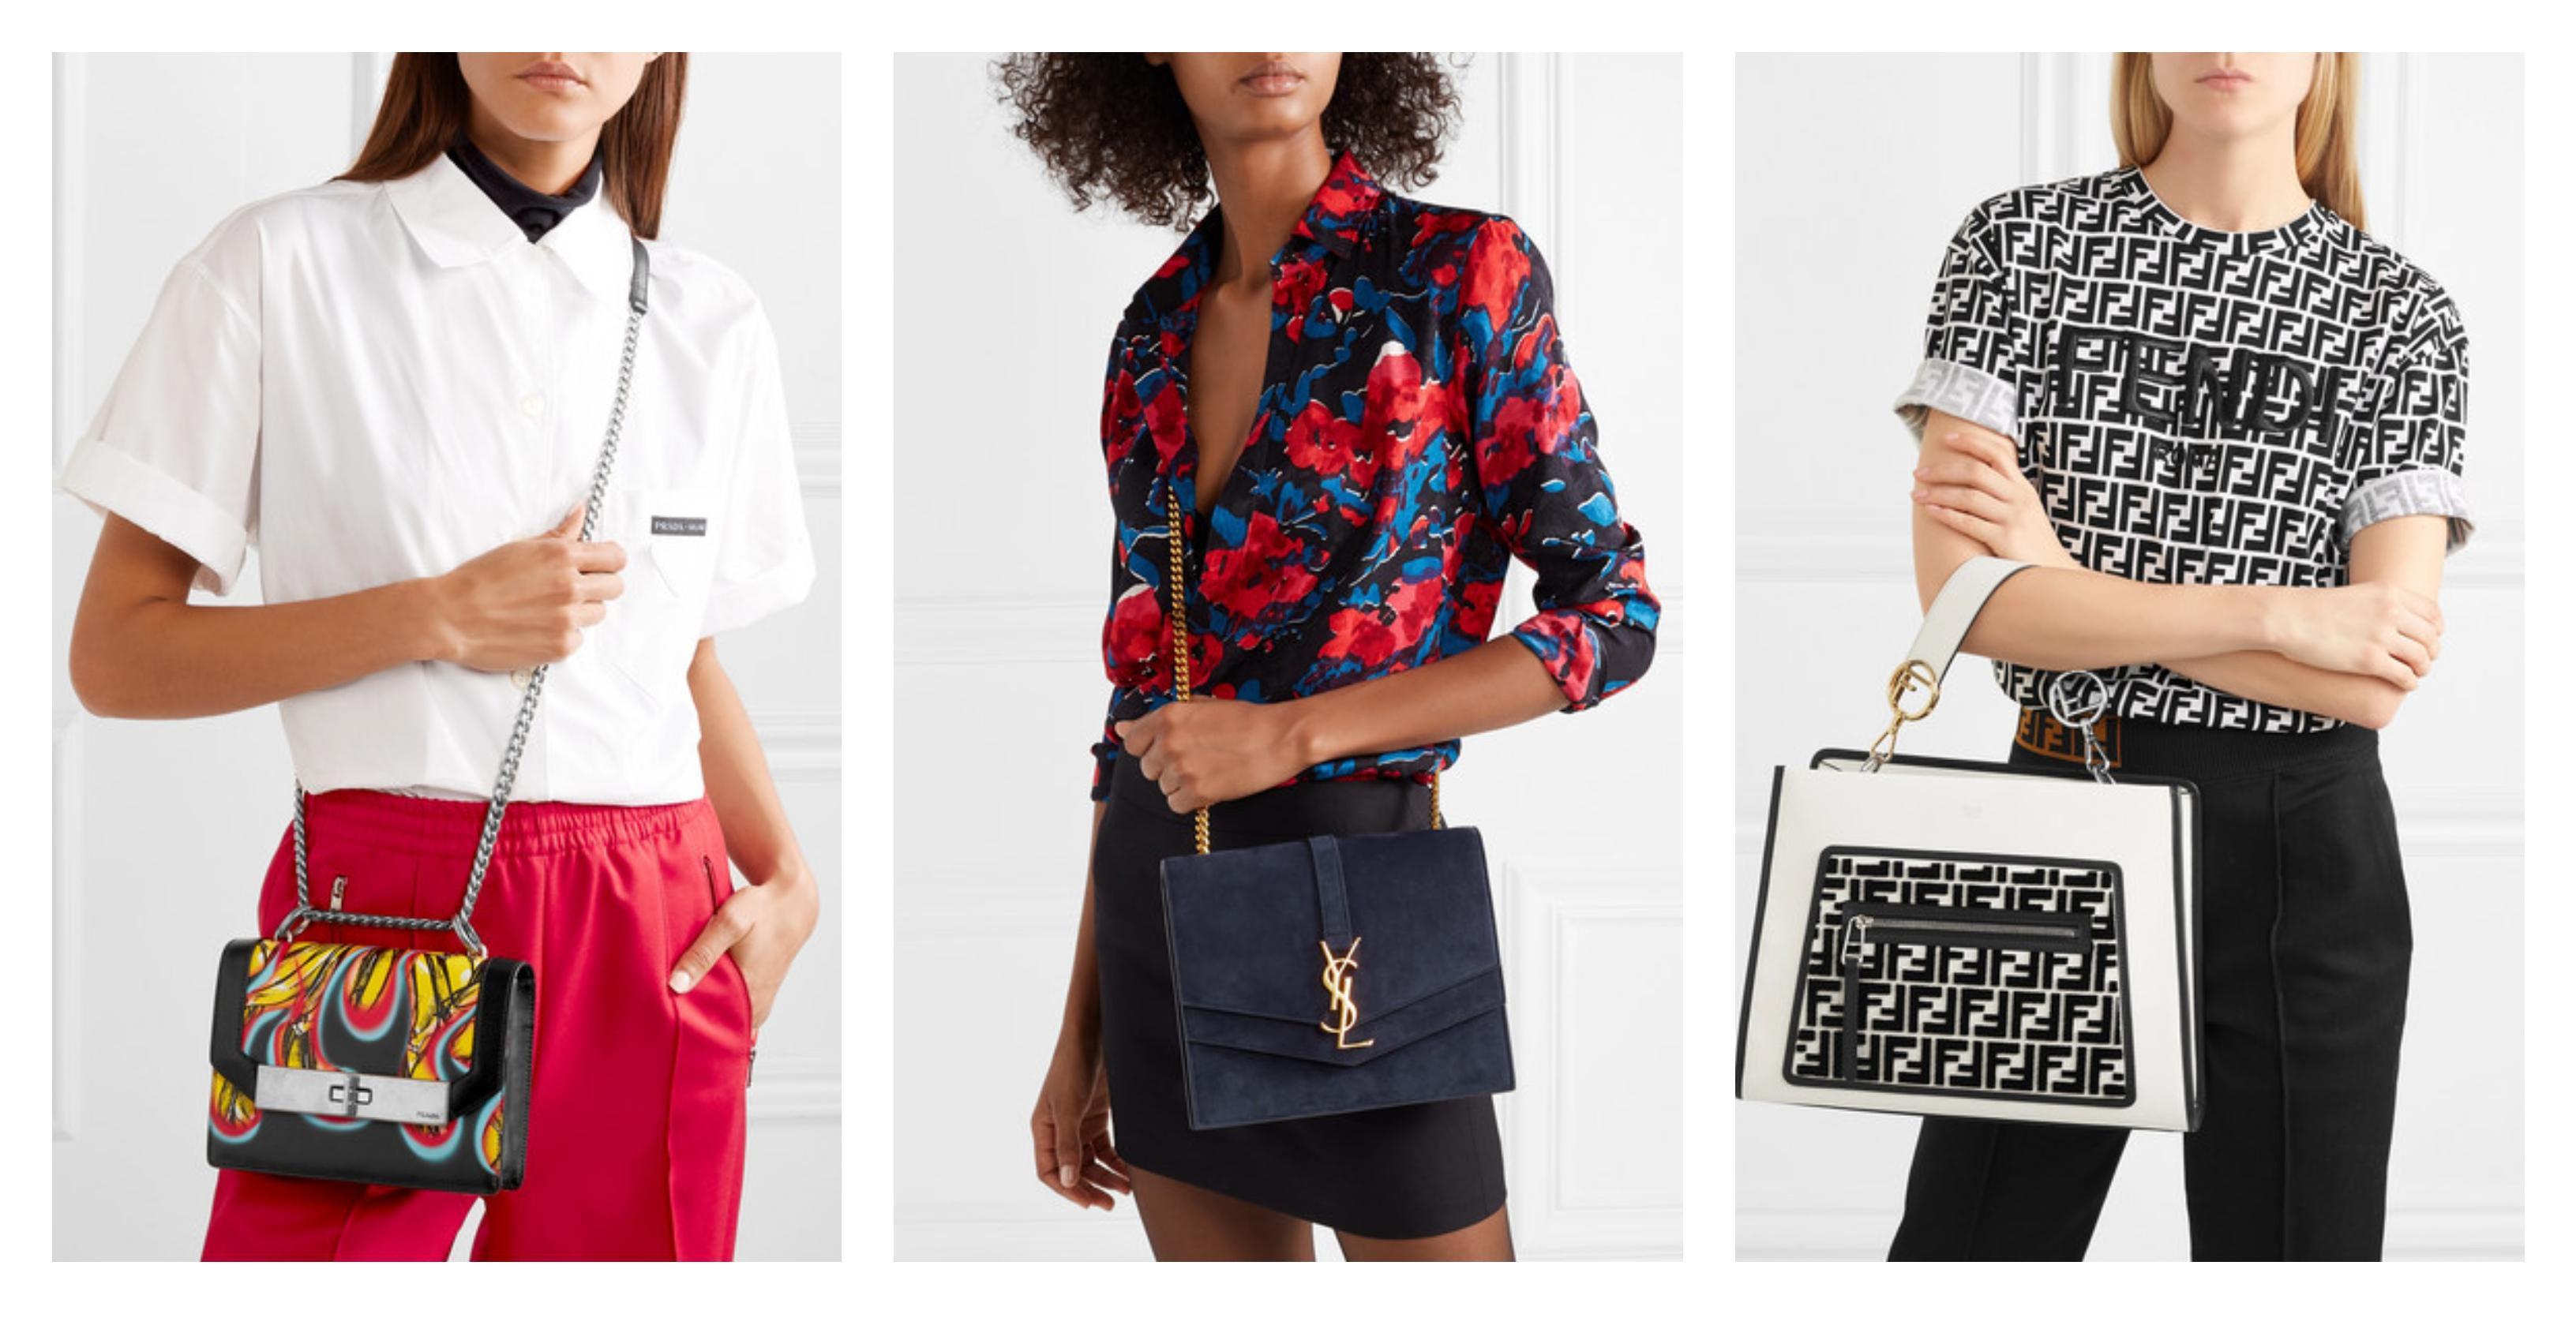 Neka 2019. započne dobrim shoppingom: Izdvojili smo dizajnerske torbe s Net-A-Portera, a još su i na sniženju!